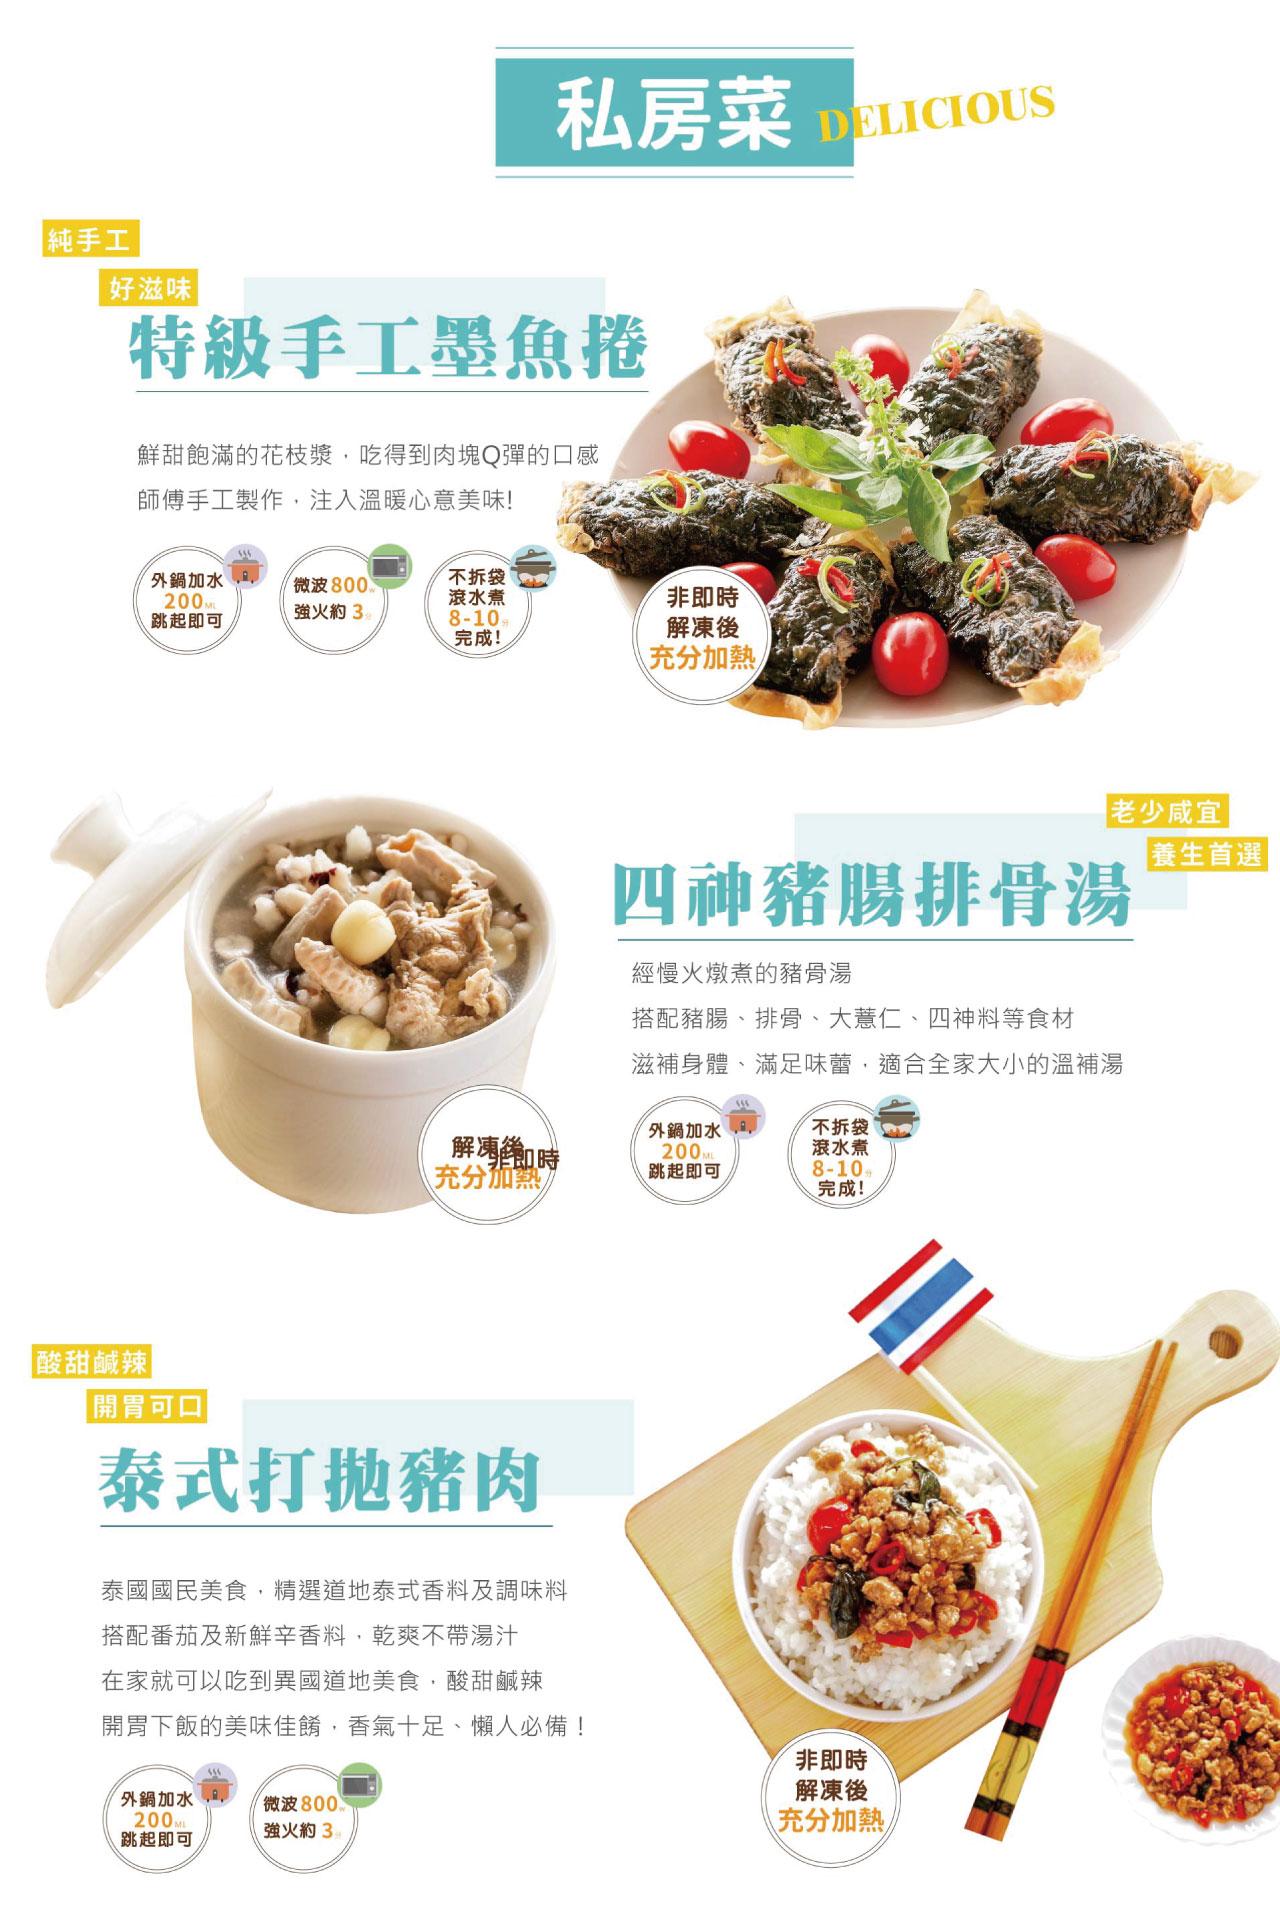 珍好食-1280-01-1